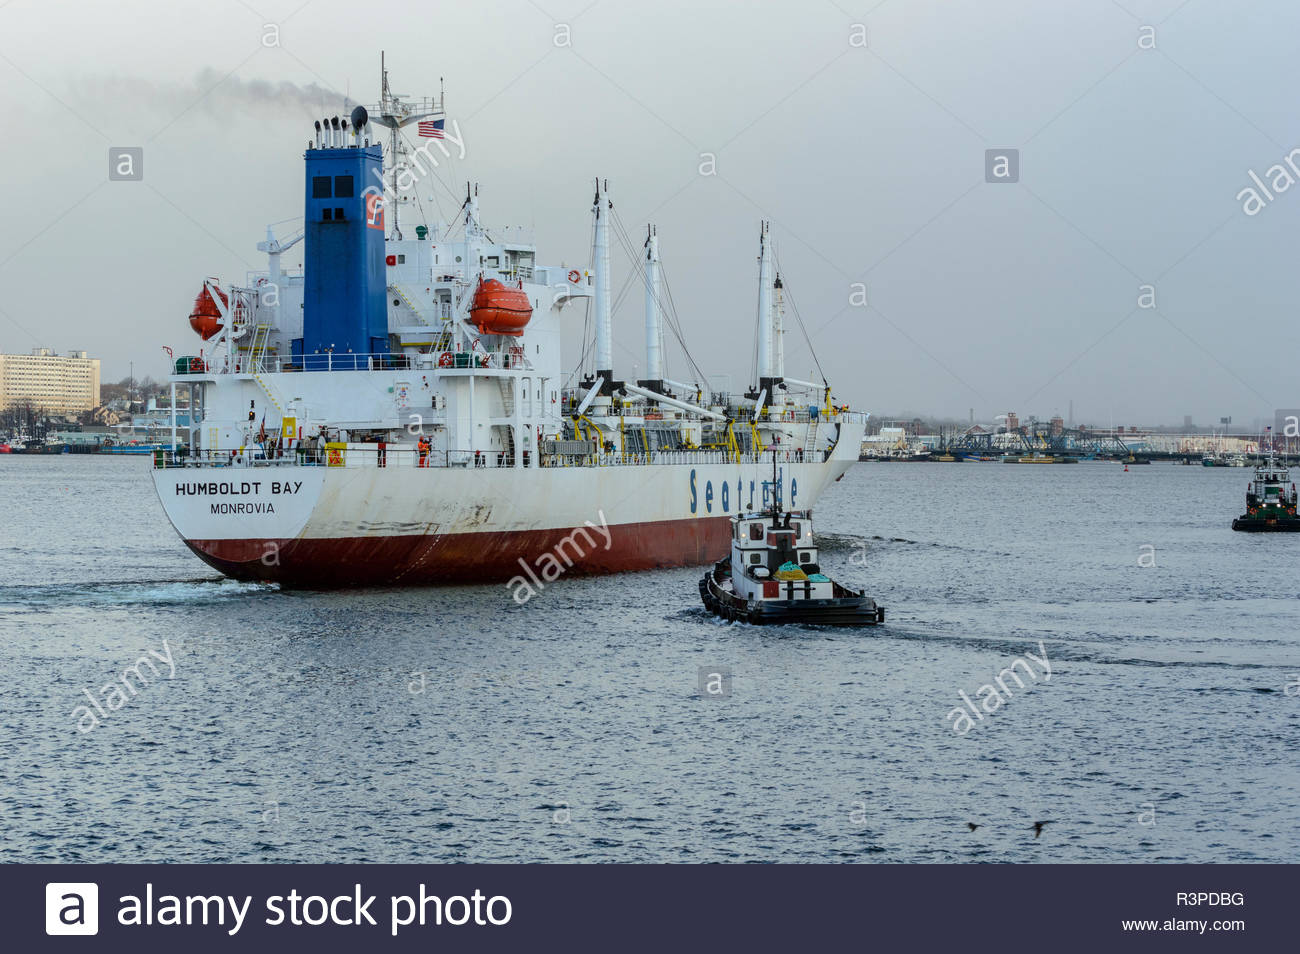 New Bedford, Massachusetts, USA - 25. März 2018: Tug Jaguar das Frachtschiff Humboldt Bay Dock tiefgekühlt an der Pier zu unterstützen. Stockbild